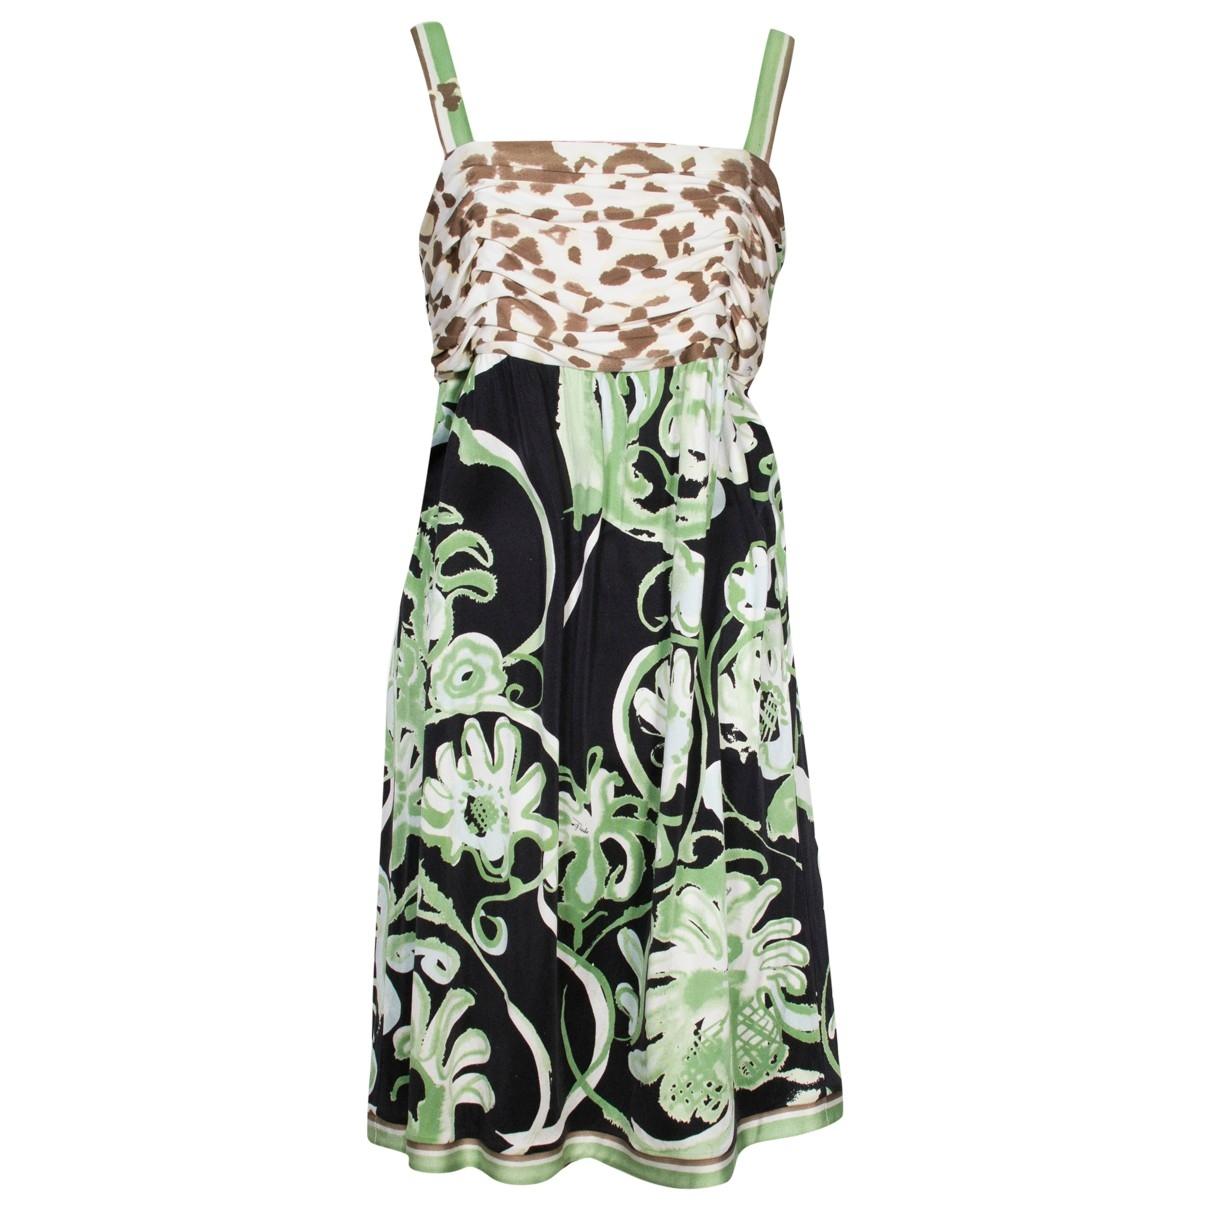 Emilio Pucci \N Green Silk dress for Women 44 IT